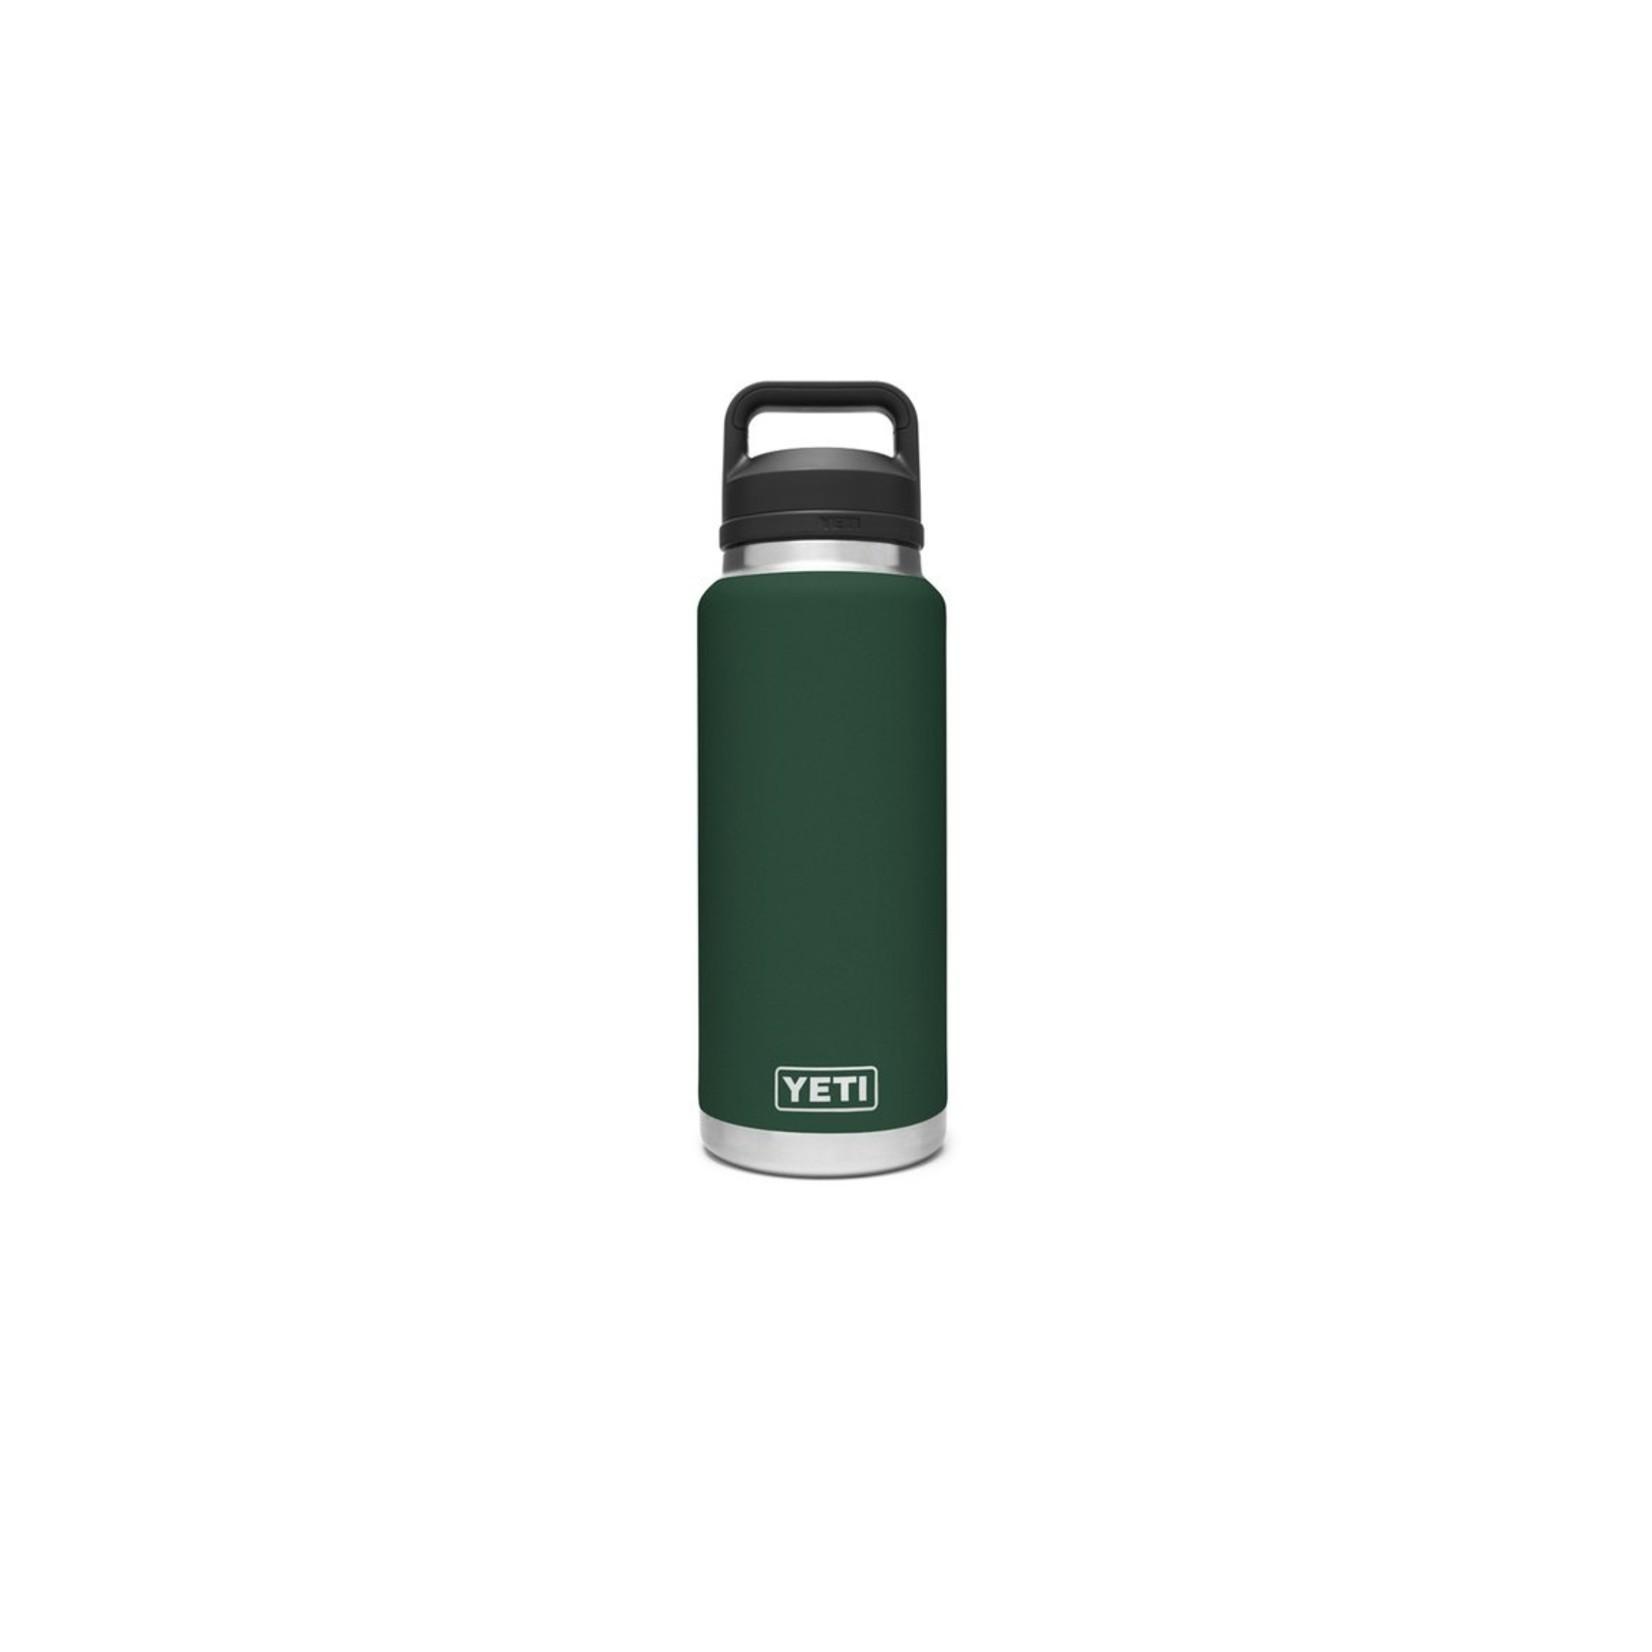 Yeti Yeti Rambler 36 Oz Bottle Chug